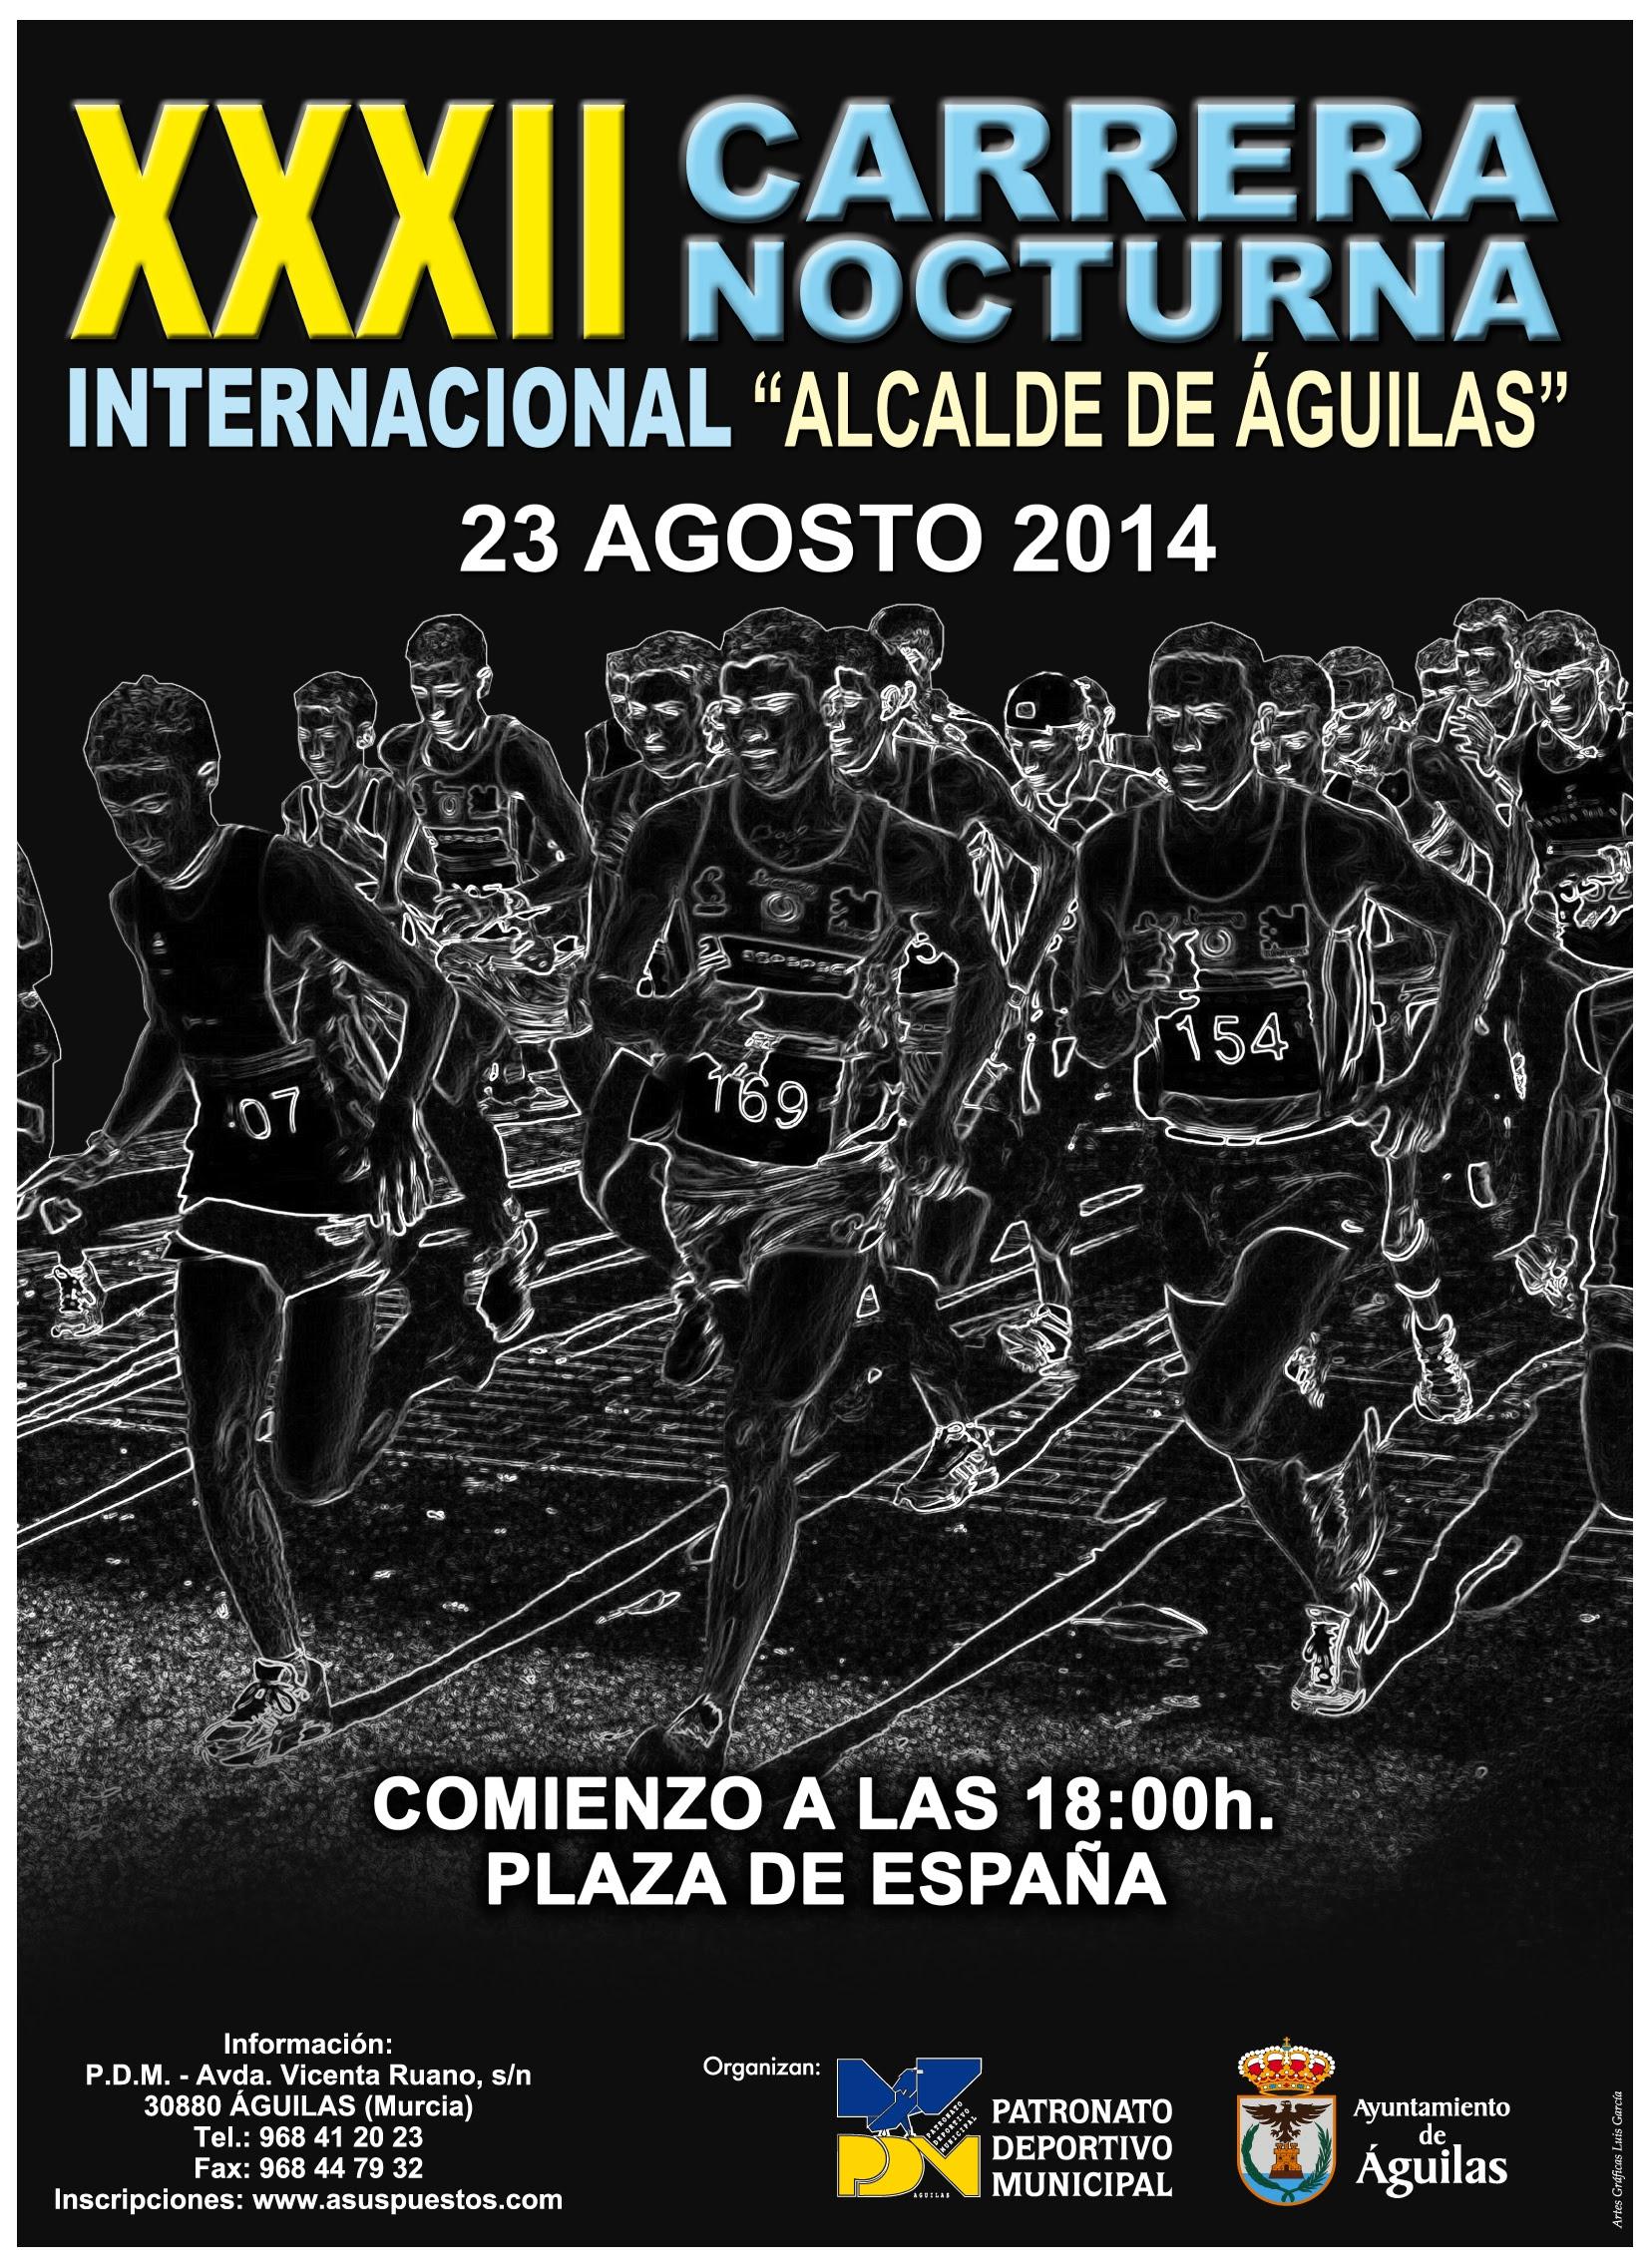 http://www.la-actualidad.com/wp-content/uploads/2014/08/cartel-nocturna-2014.jpg